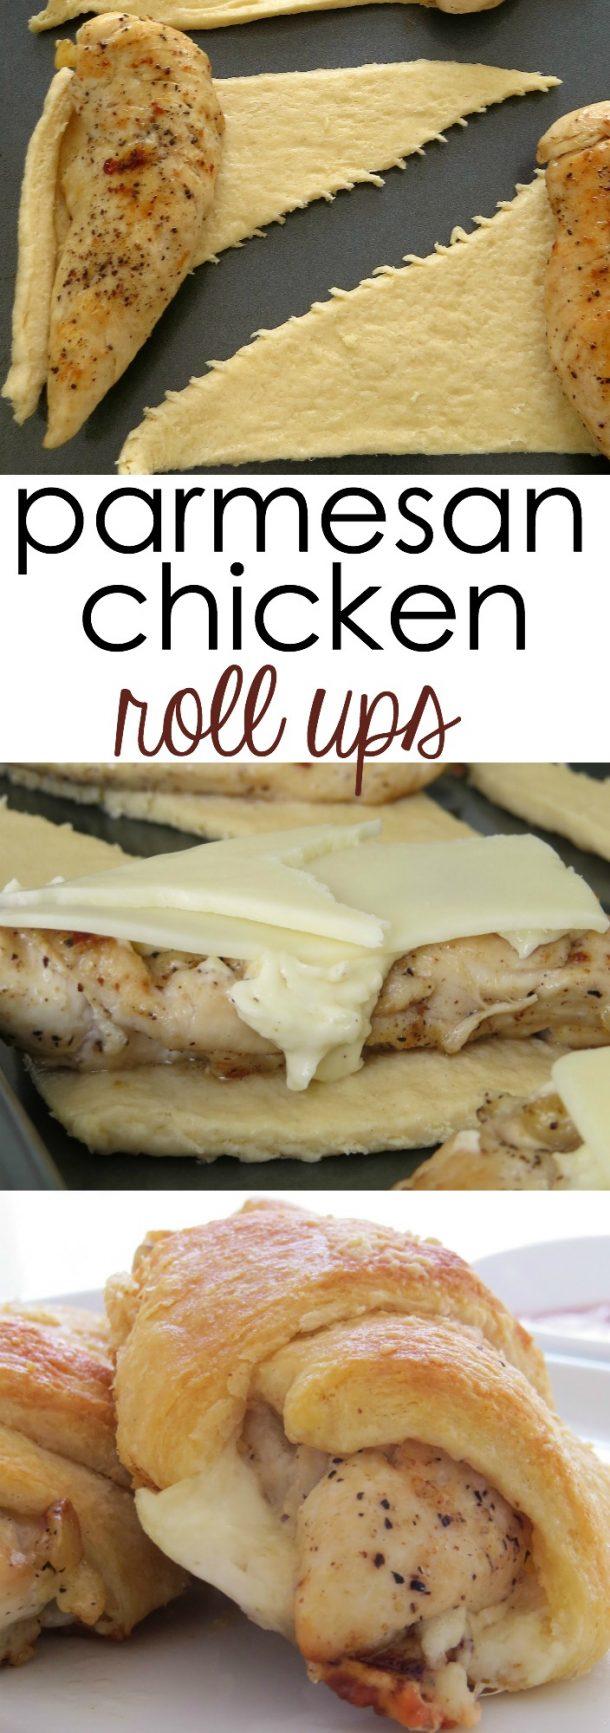 Quick Dinner Ideas - Parmesan Chicken Roll Ups Recipe via Written Reality